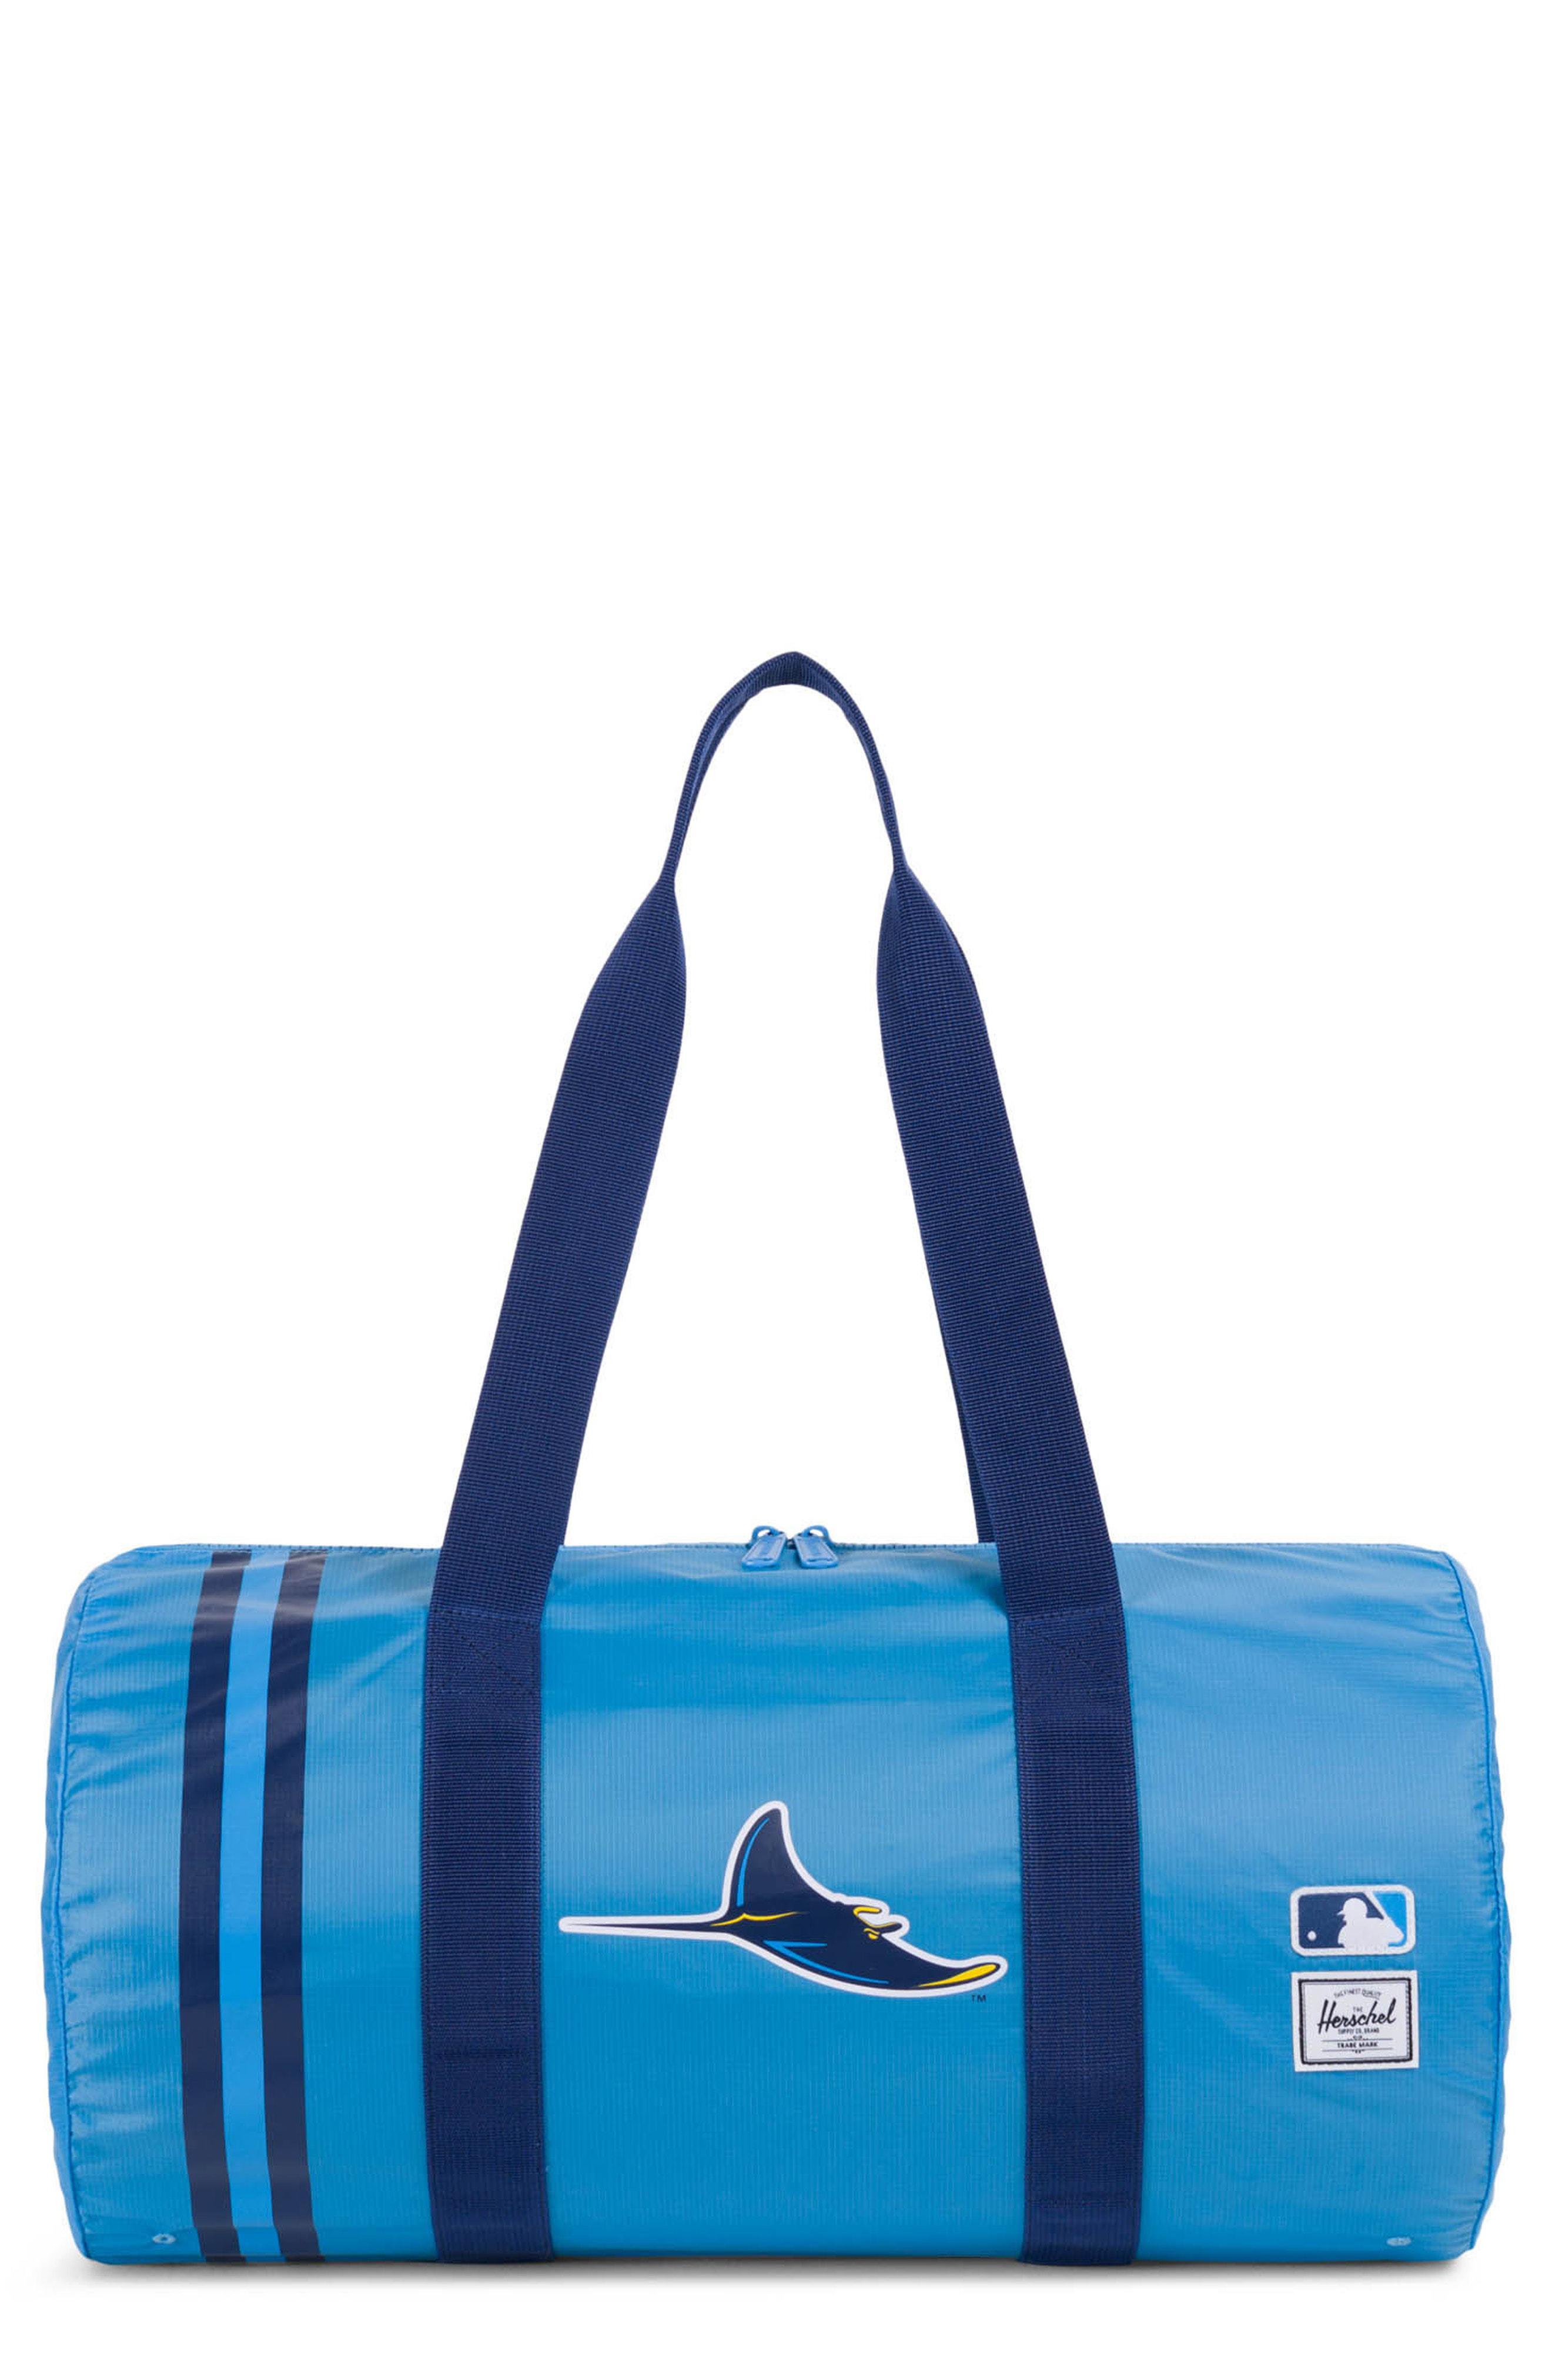 1016f69260 Lyst - Herschel Supply Co. Packable - Mlb American League Duffel Bag ...